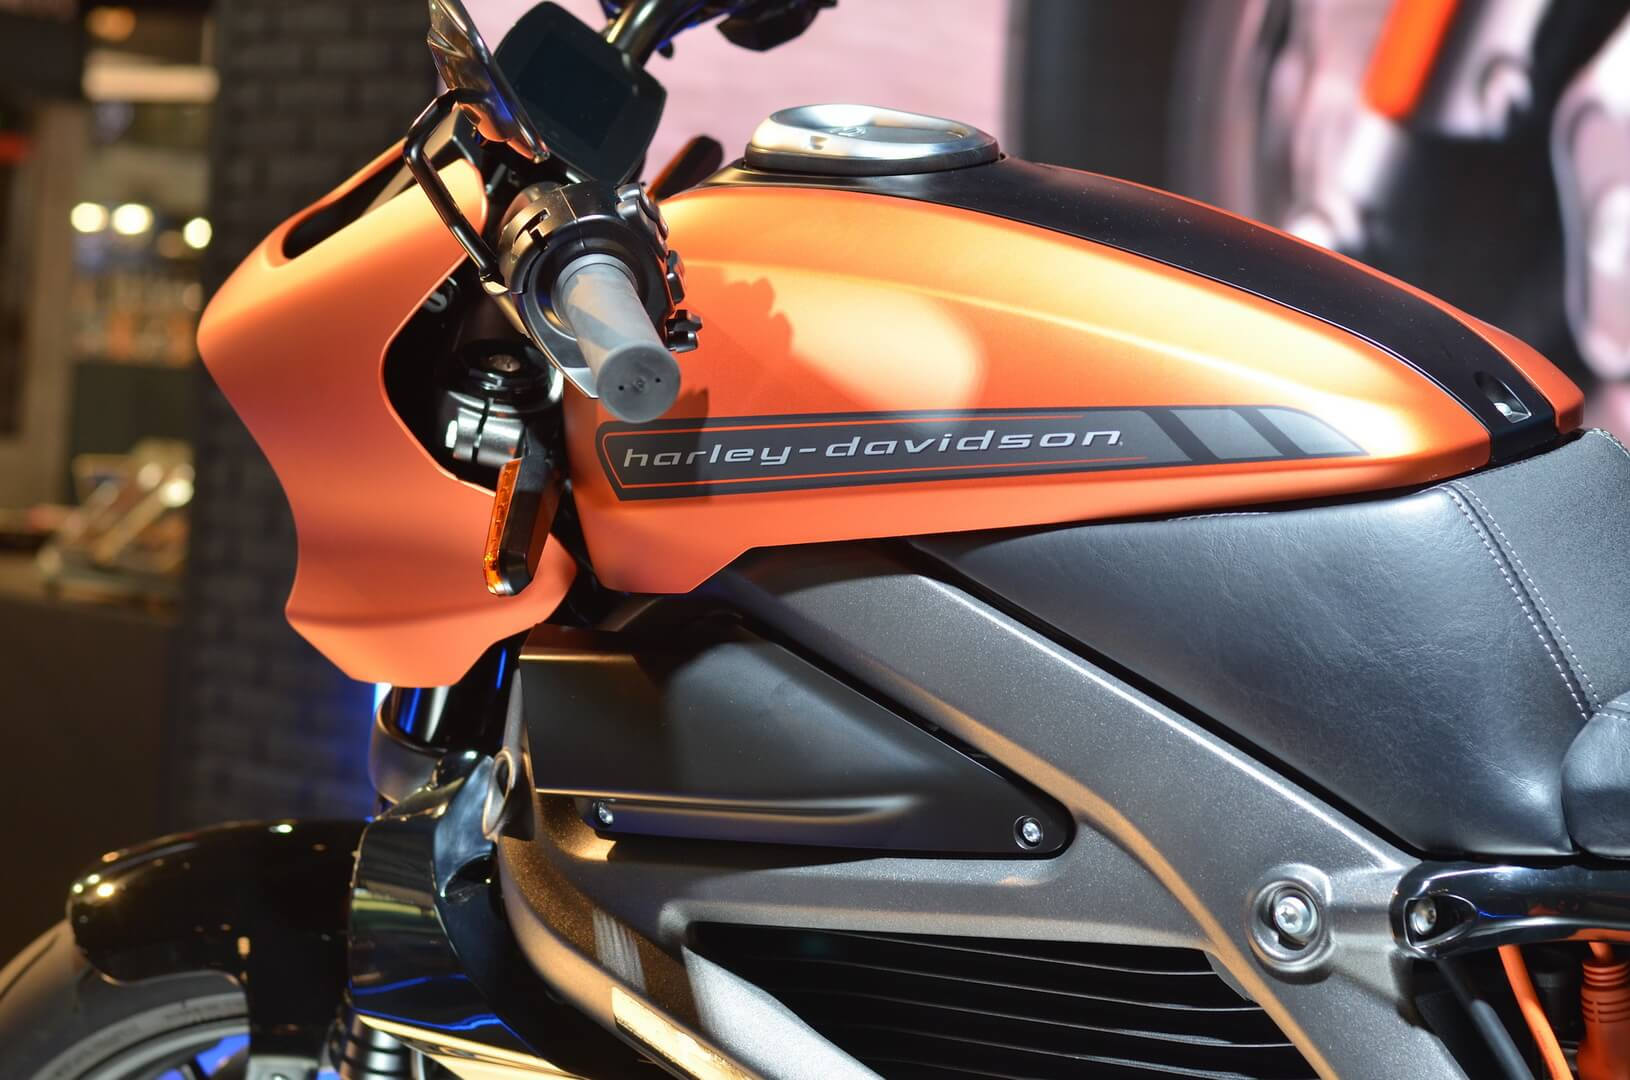 Электробайк Harley-Davidson LiveWire на мотовыставке EICMA в Милане